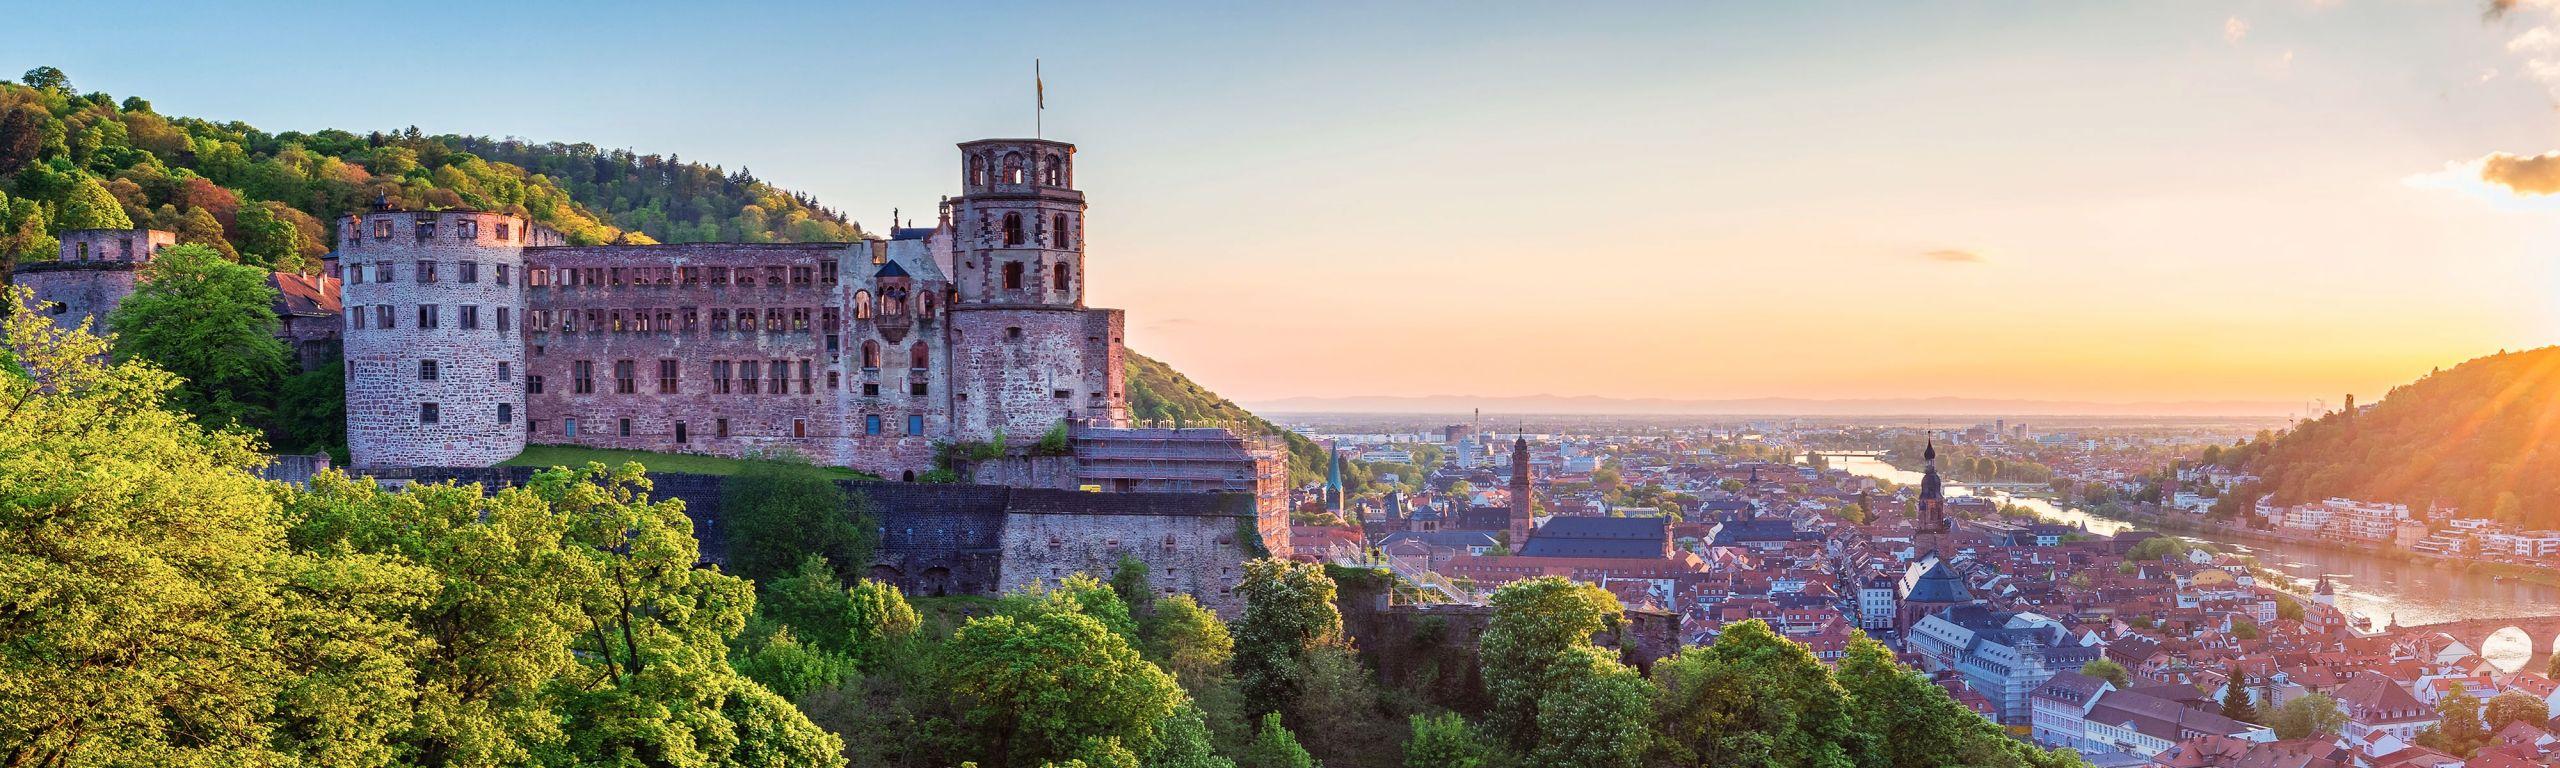 Englischer Garten Berlin Einzigartig Grand tour Of Germany